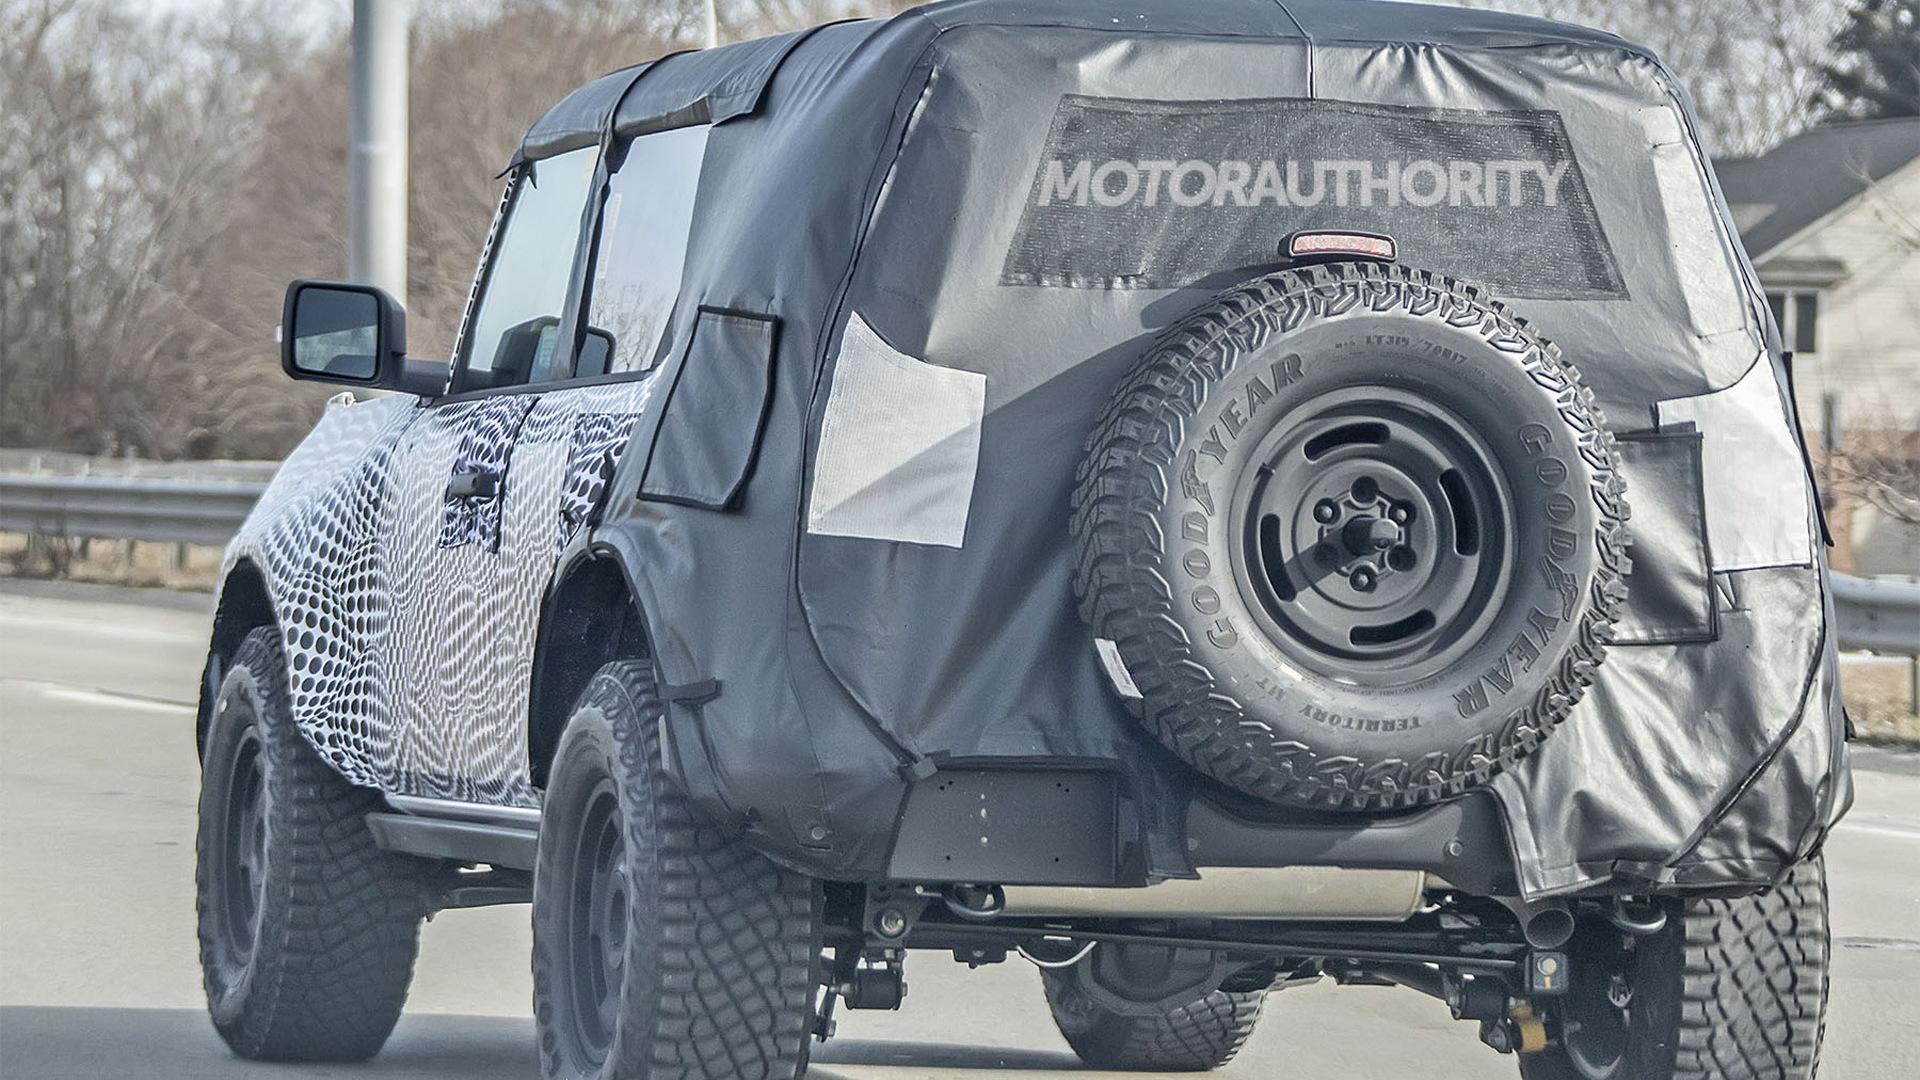 2022 Ford Bronco Heritage Edition spy shots - Photo credit:S. Baldauf/SB-Medien